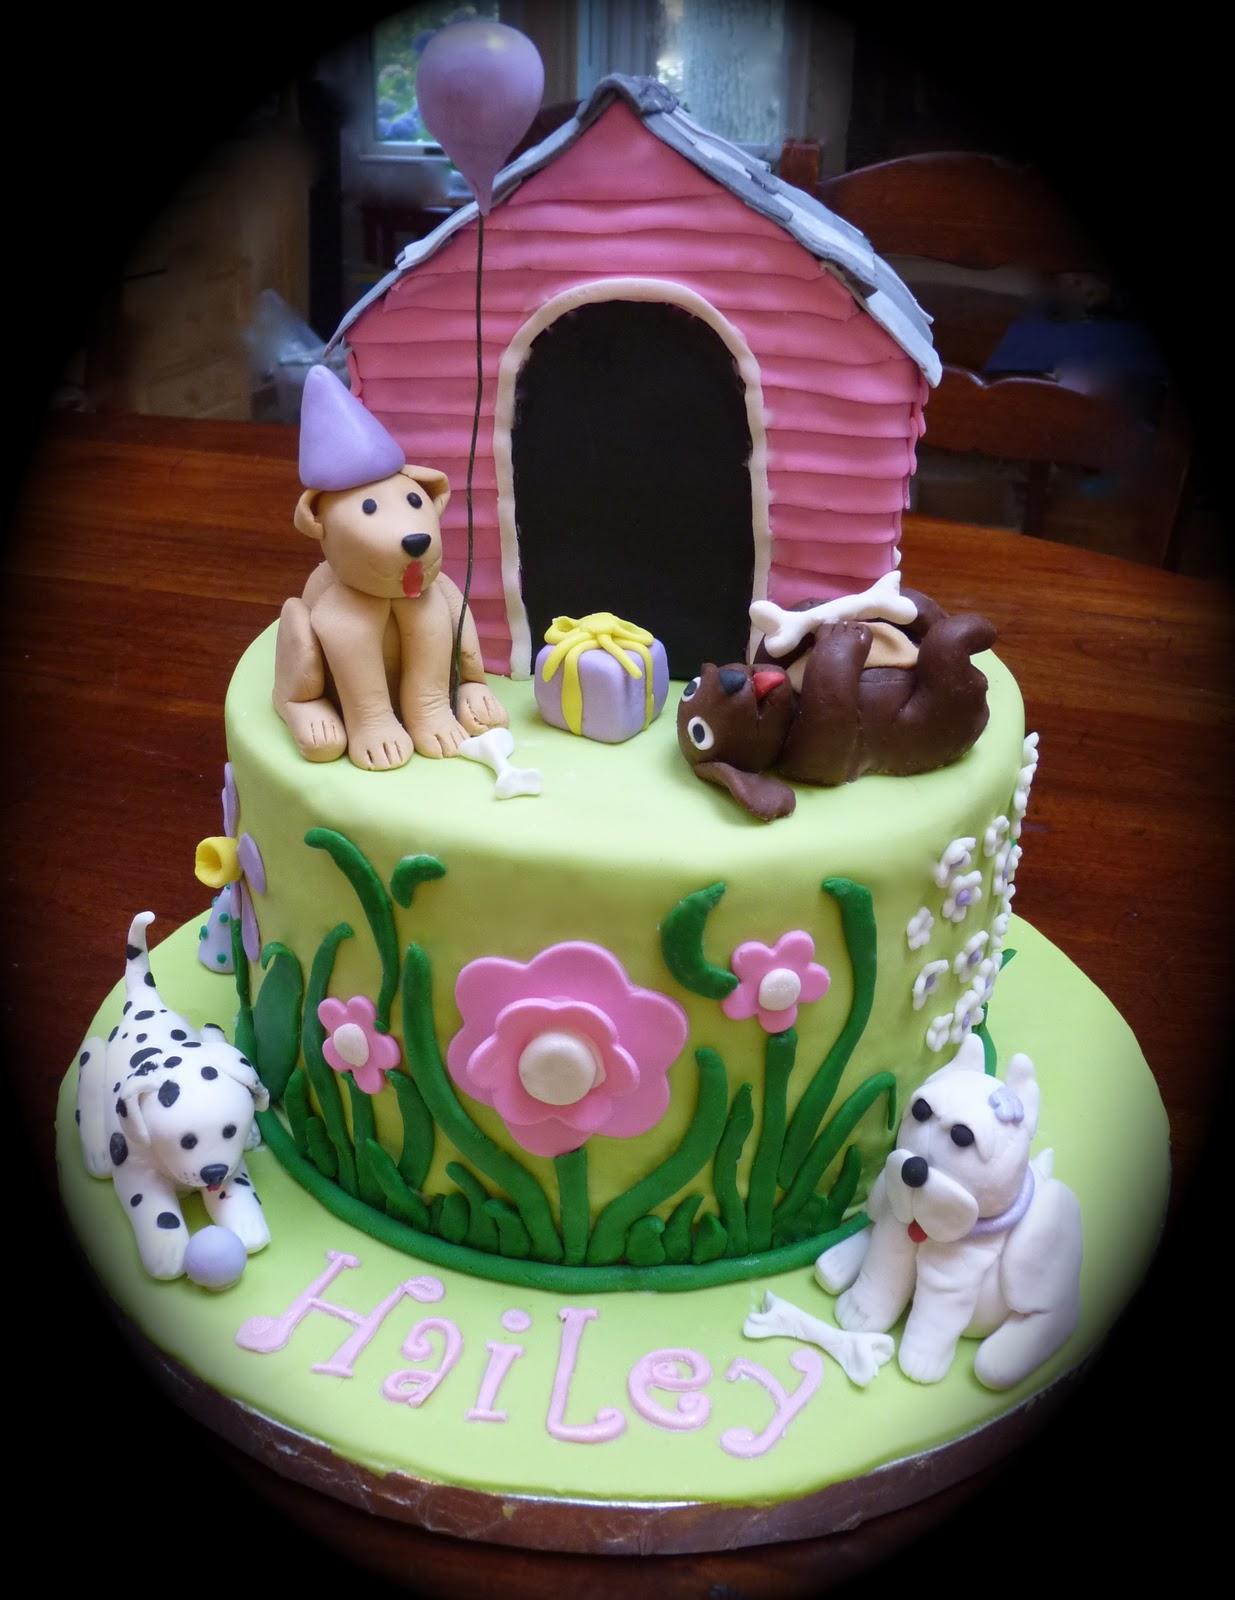 Pleasing Puppy Cakes Decoration Ideas Little Birthday Cakes Funny Birthday Cards Online Chimdamsfinfo